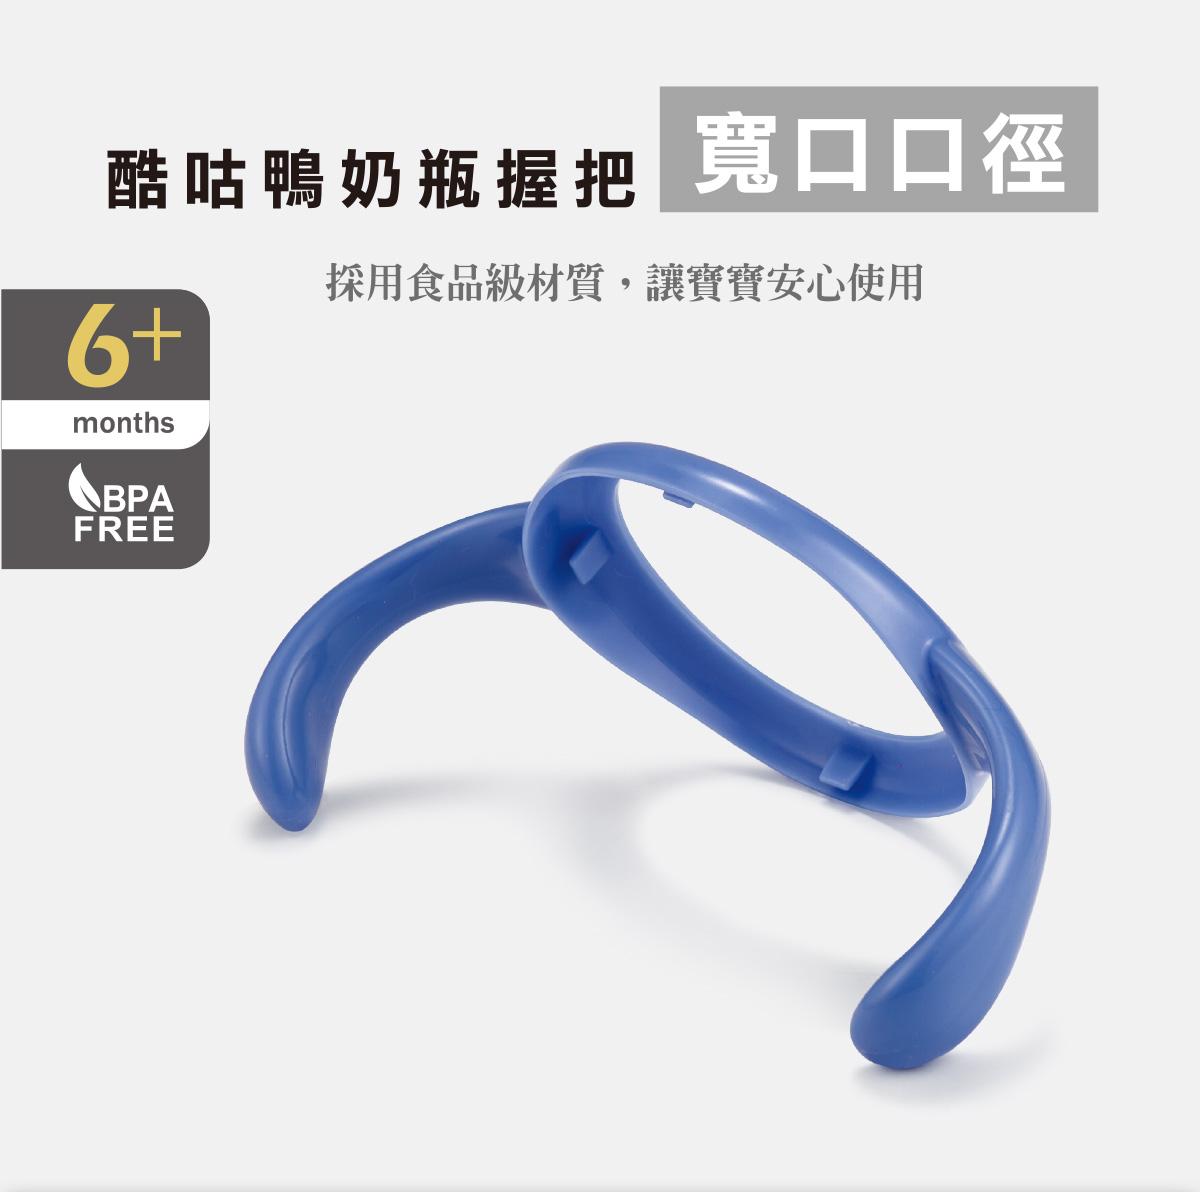 proimages/bottles_accessories/Accessories/5497/5497-EDM-01.jpg